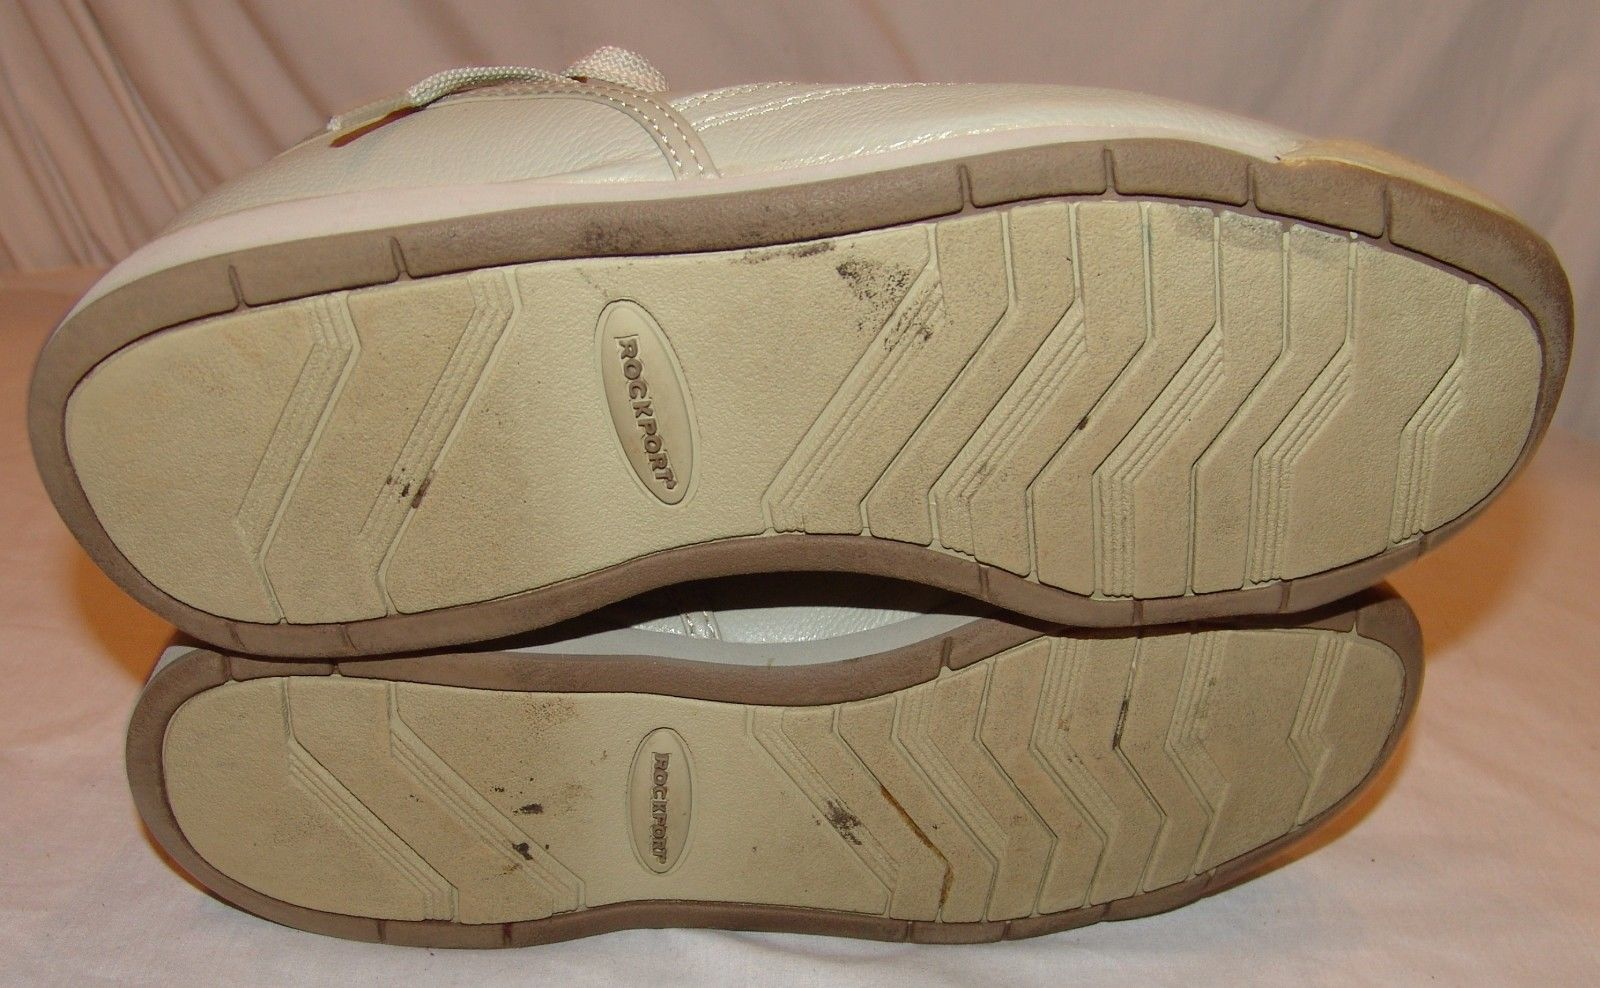 d2feb8e0462 Rockport Prowalker Zapatos de Marcha Hombre 8 1 2 8.5 Beis pro Vehículo  Informal